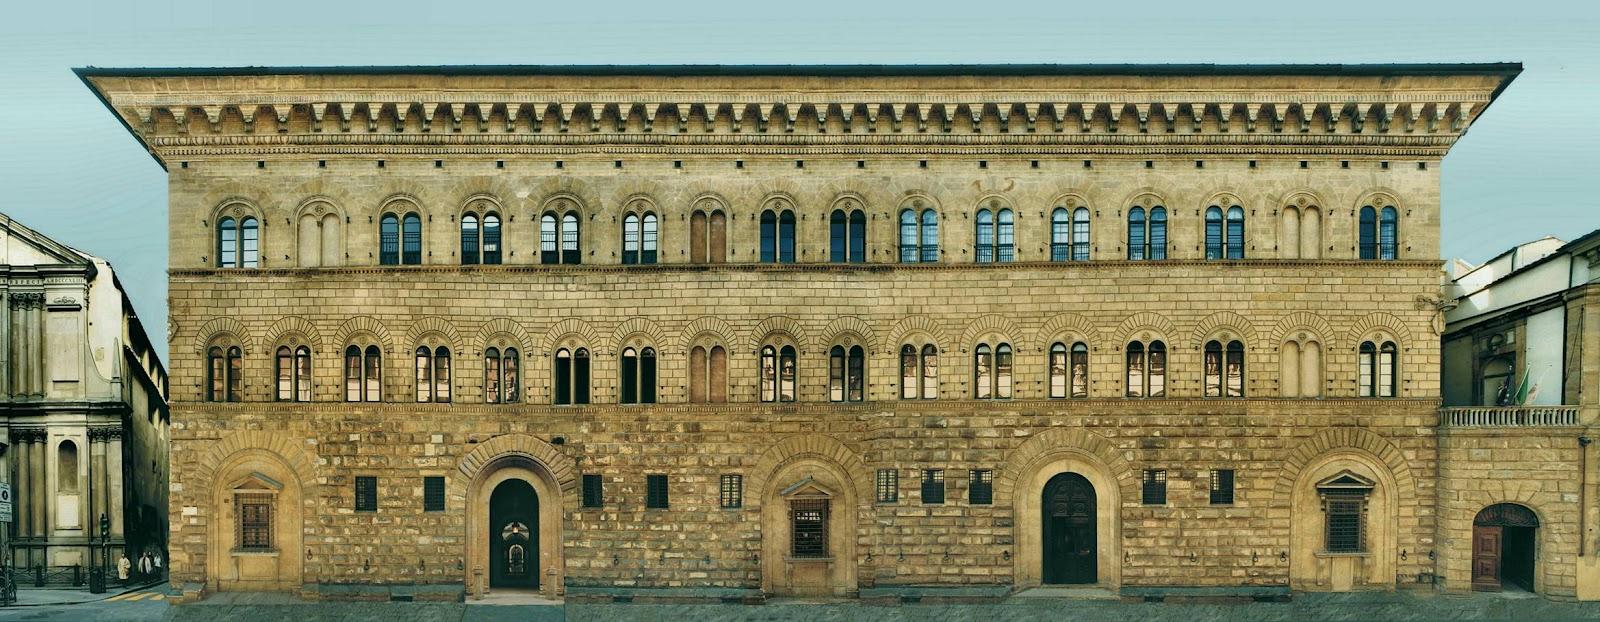 Art en vena arquitectura del quattrocento itali - Casa base milano ...